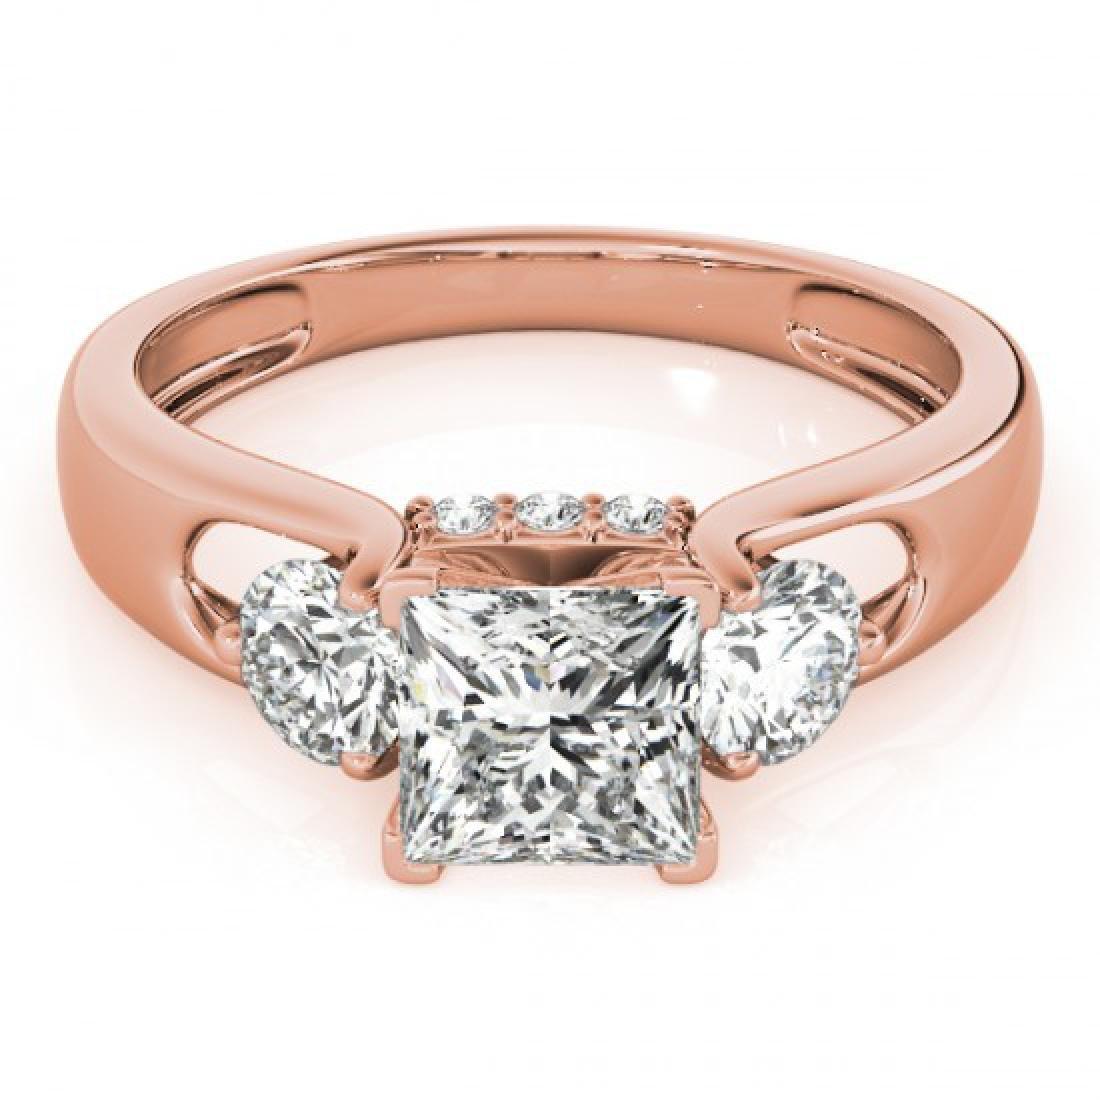 1.6 CTW Certified VS/SI Princess Cut Diamond 3 Stone